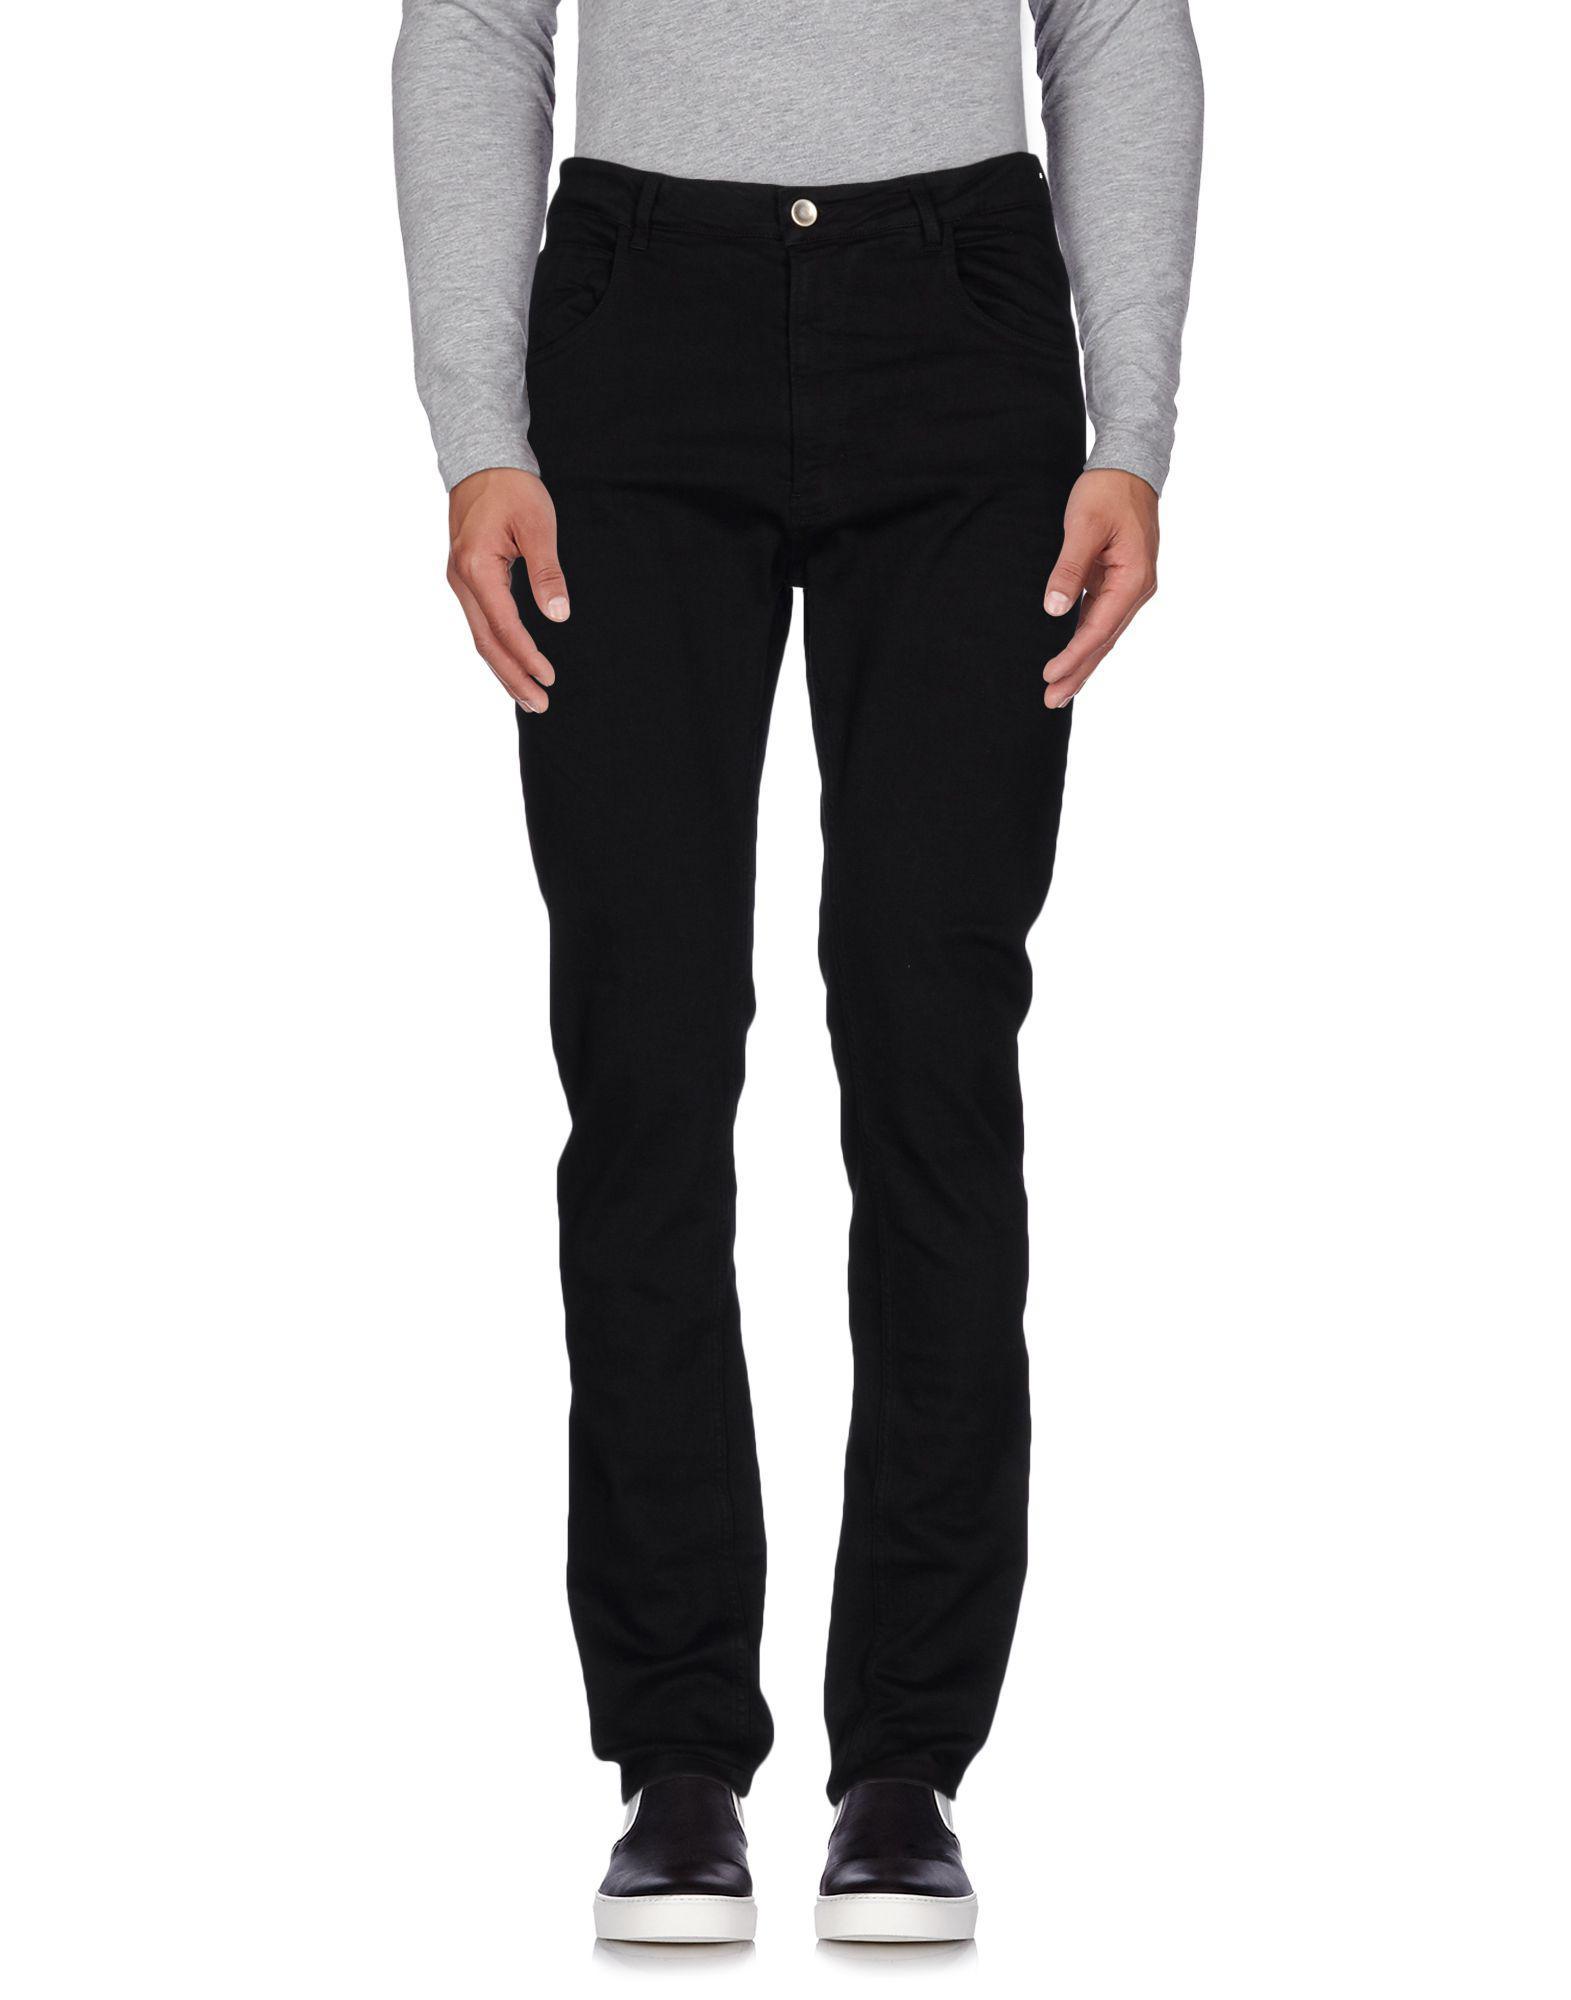 DENIM - Denim trousers Po TSukdd